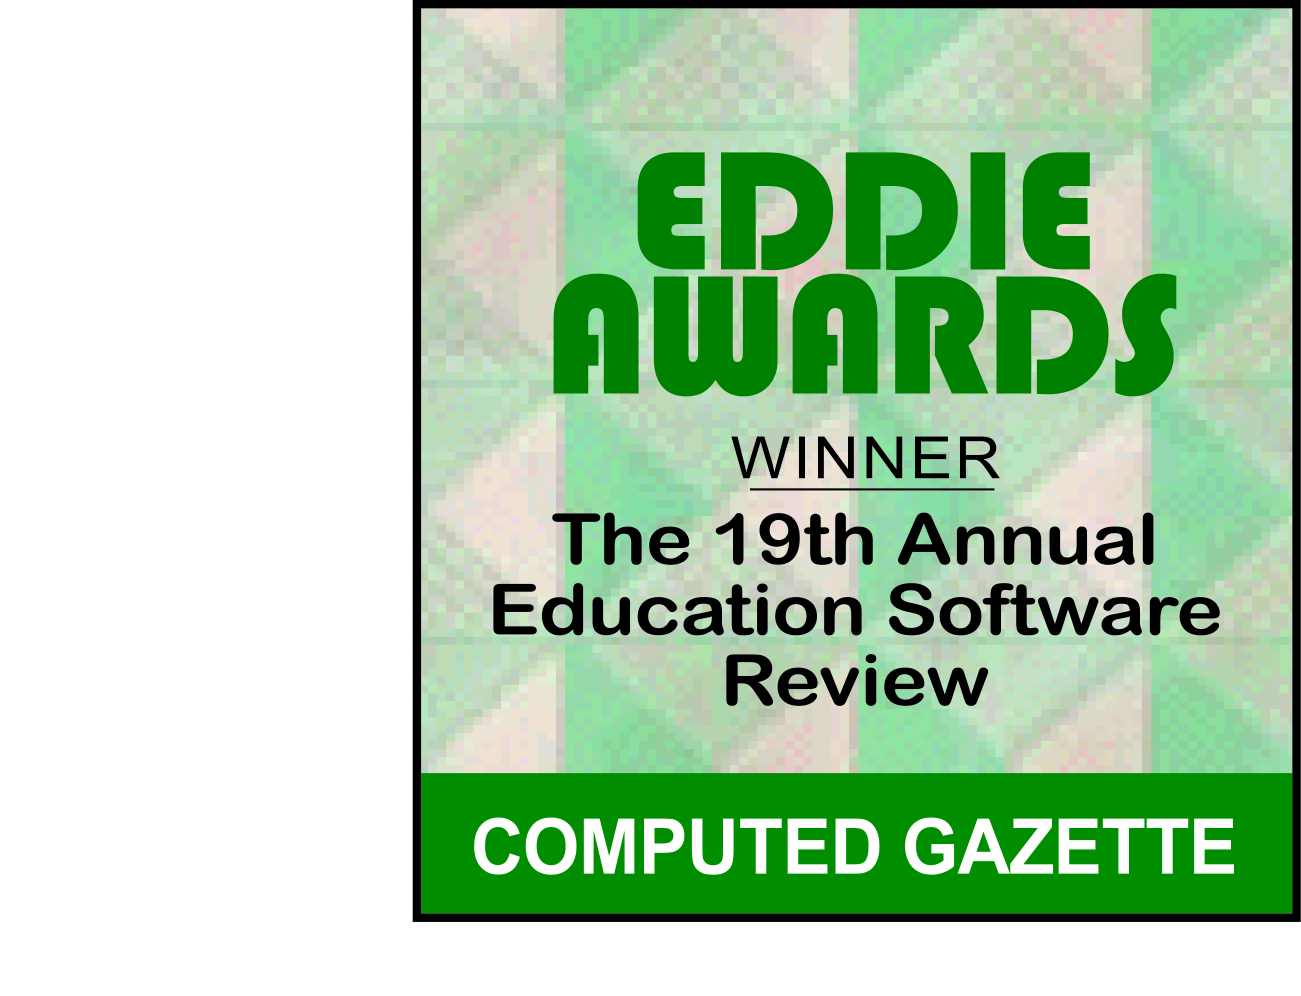 2014 EDD WINN LOGO (1)